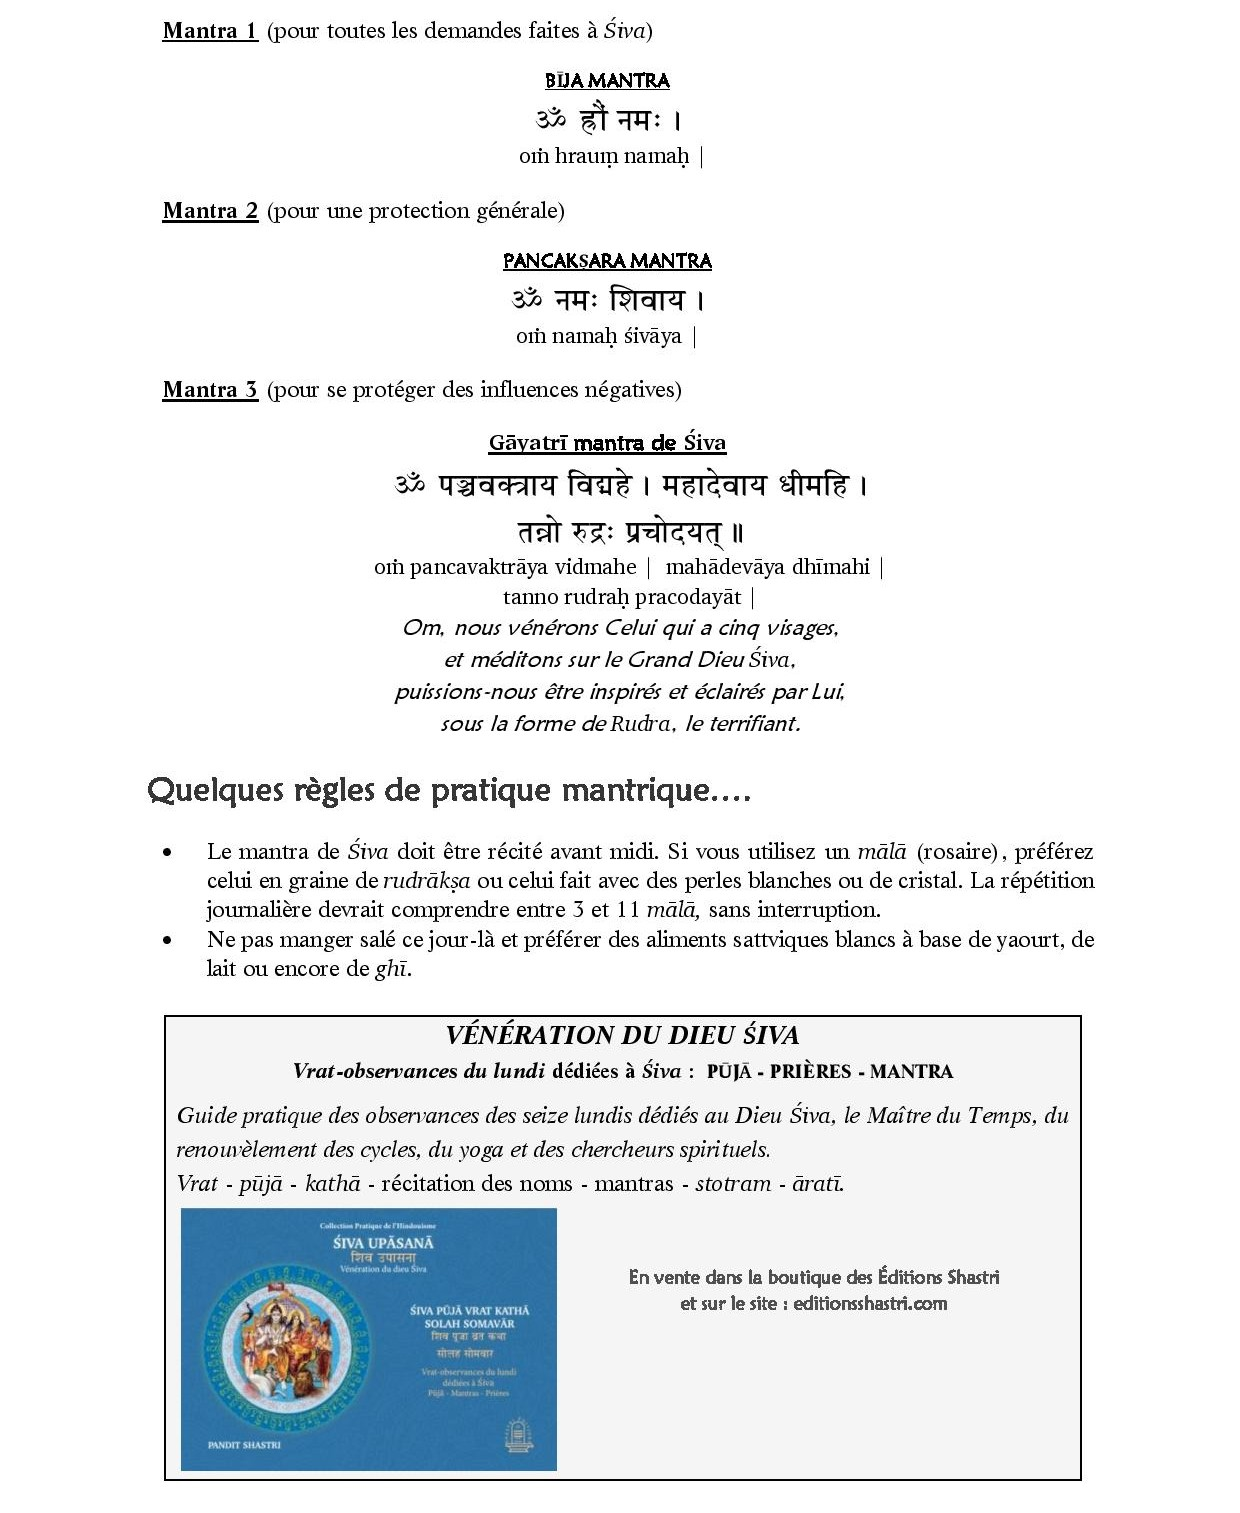 shiva sravana texte 2020-page-005-1